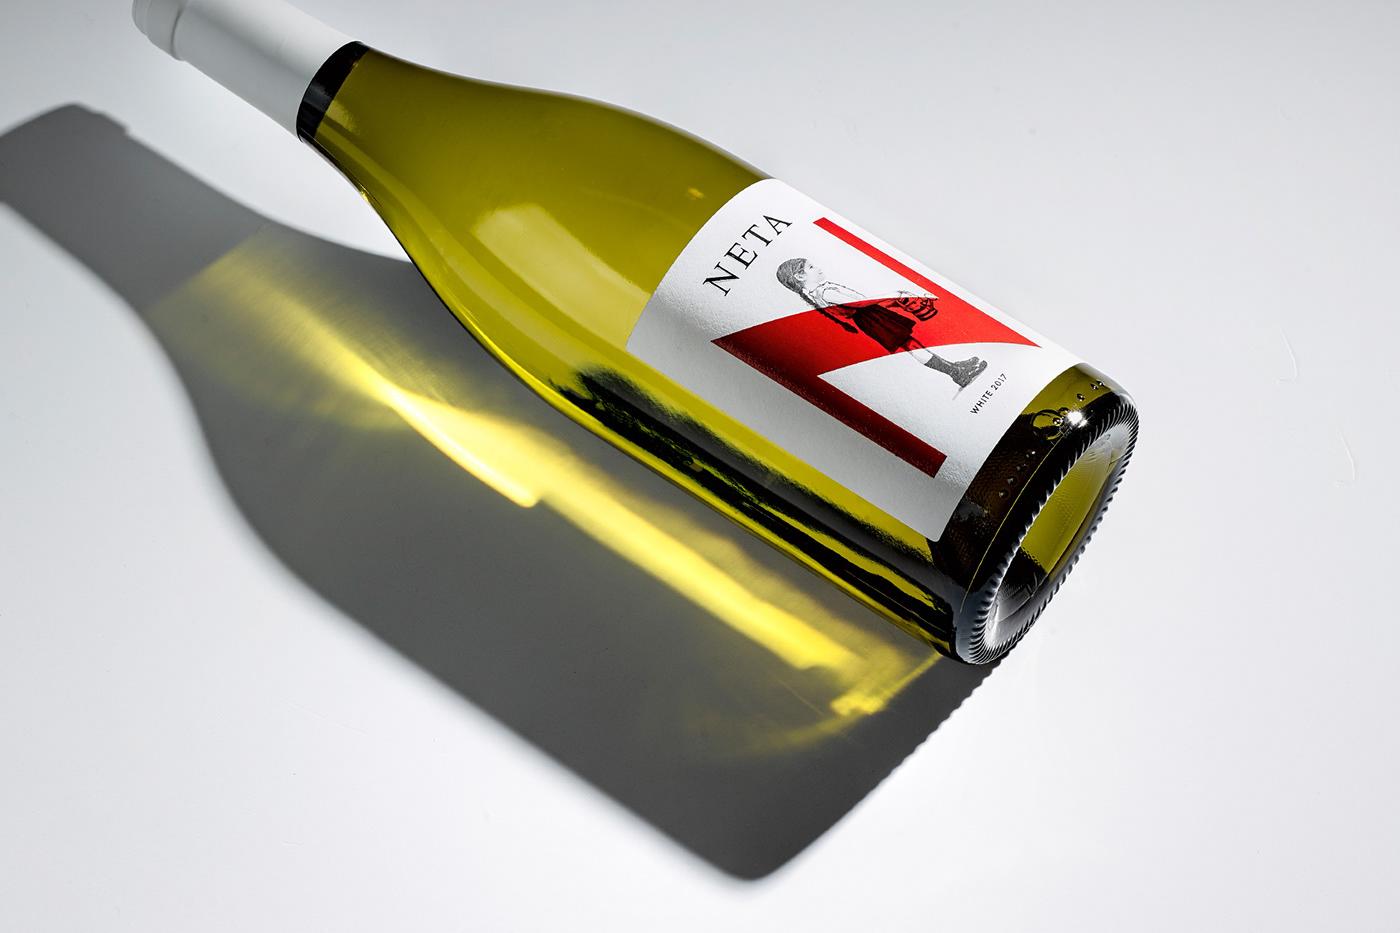 graphic design  branding  packaging design winery Dov Kroll visual identity wine label brand identity ILLUSTRATION